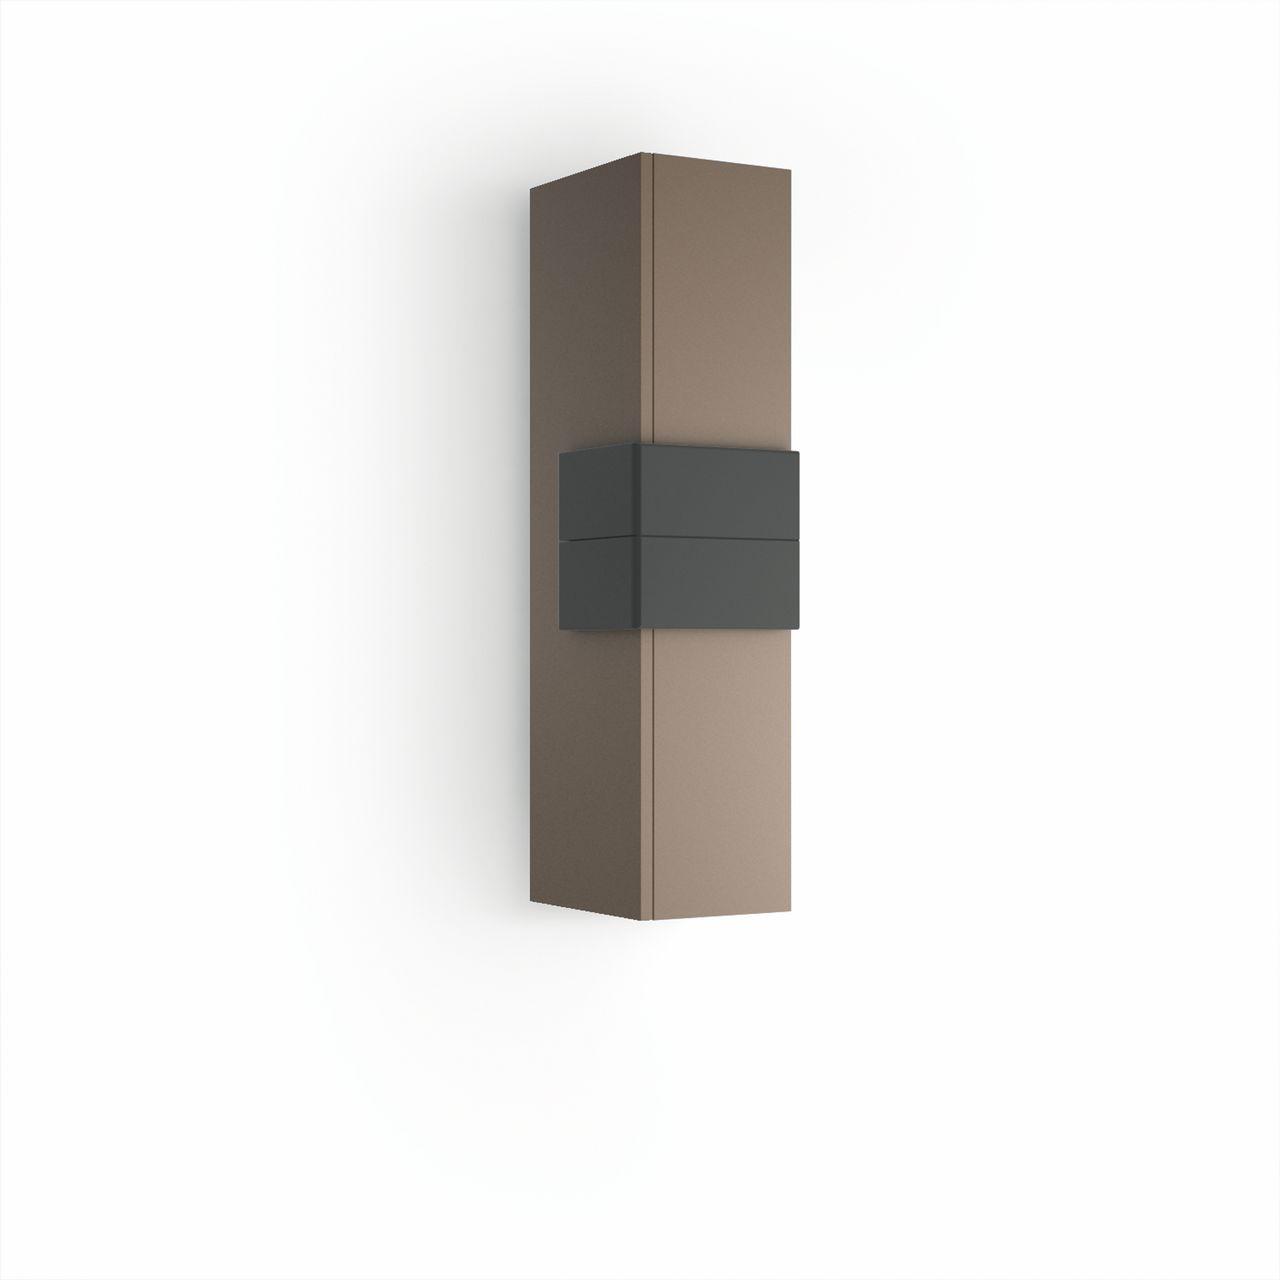 Muebles Cronos halfhoge badkamerkast 100cm mokka - antraciet